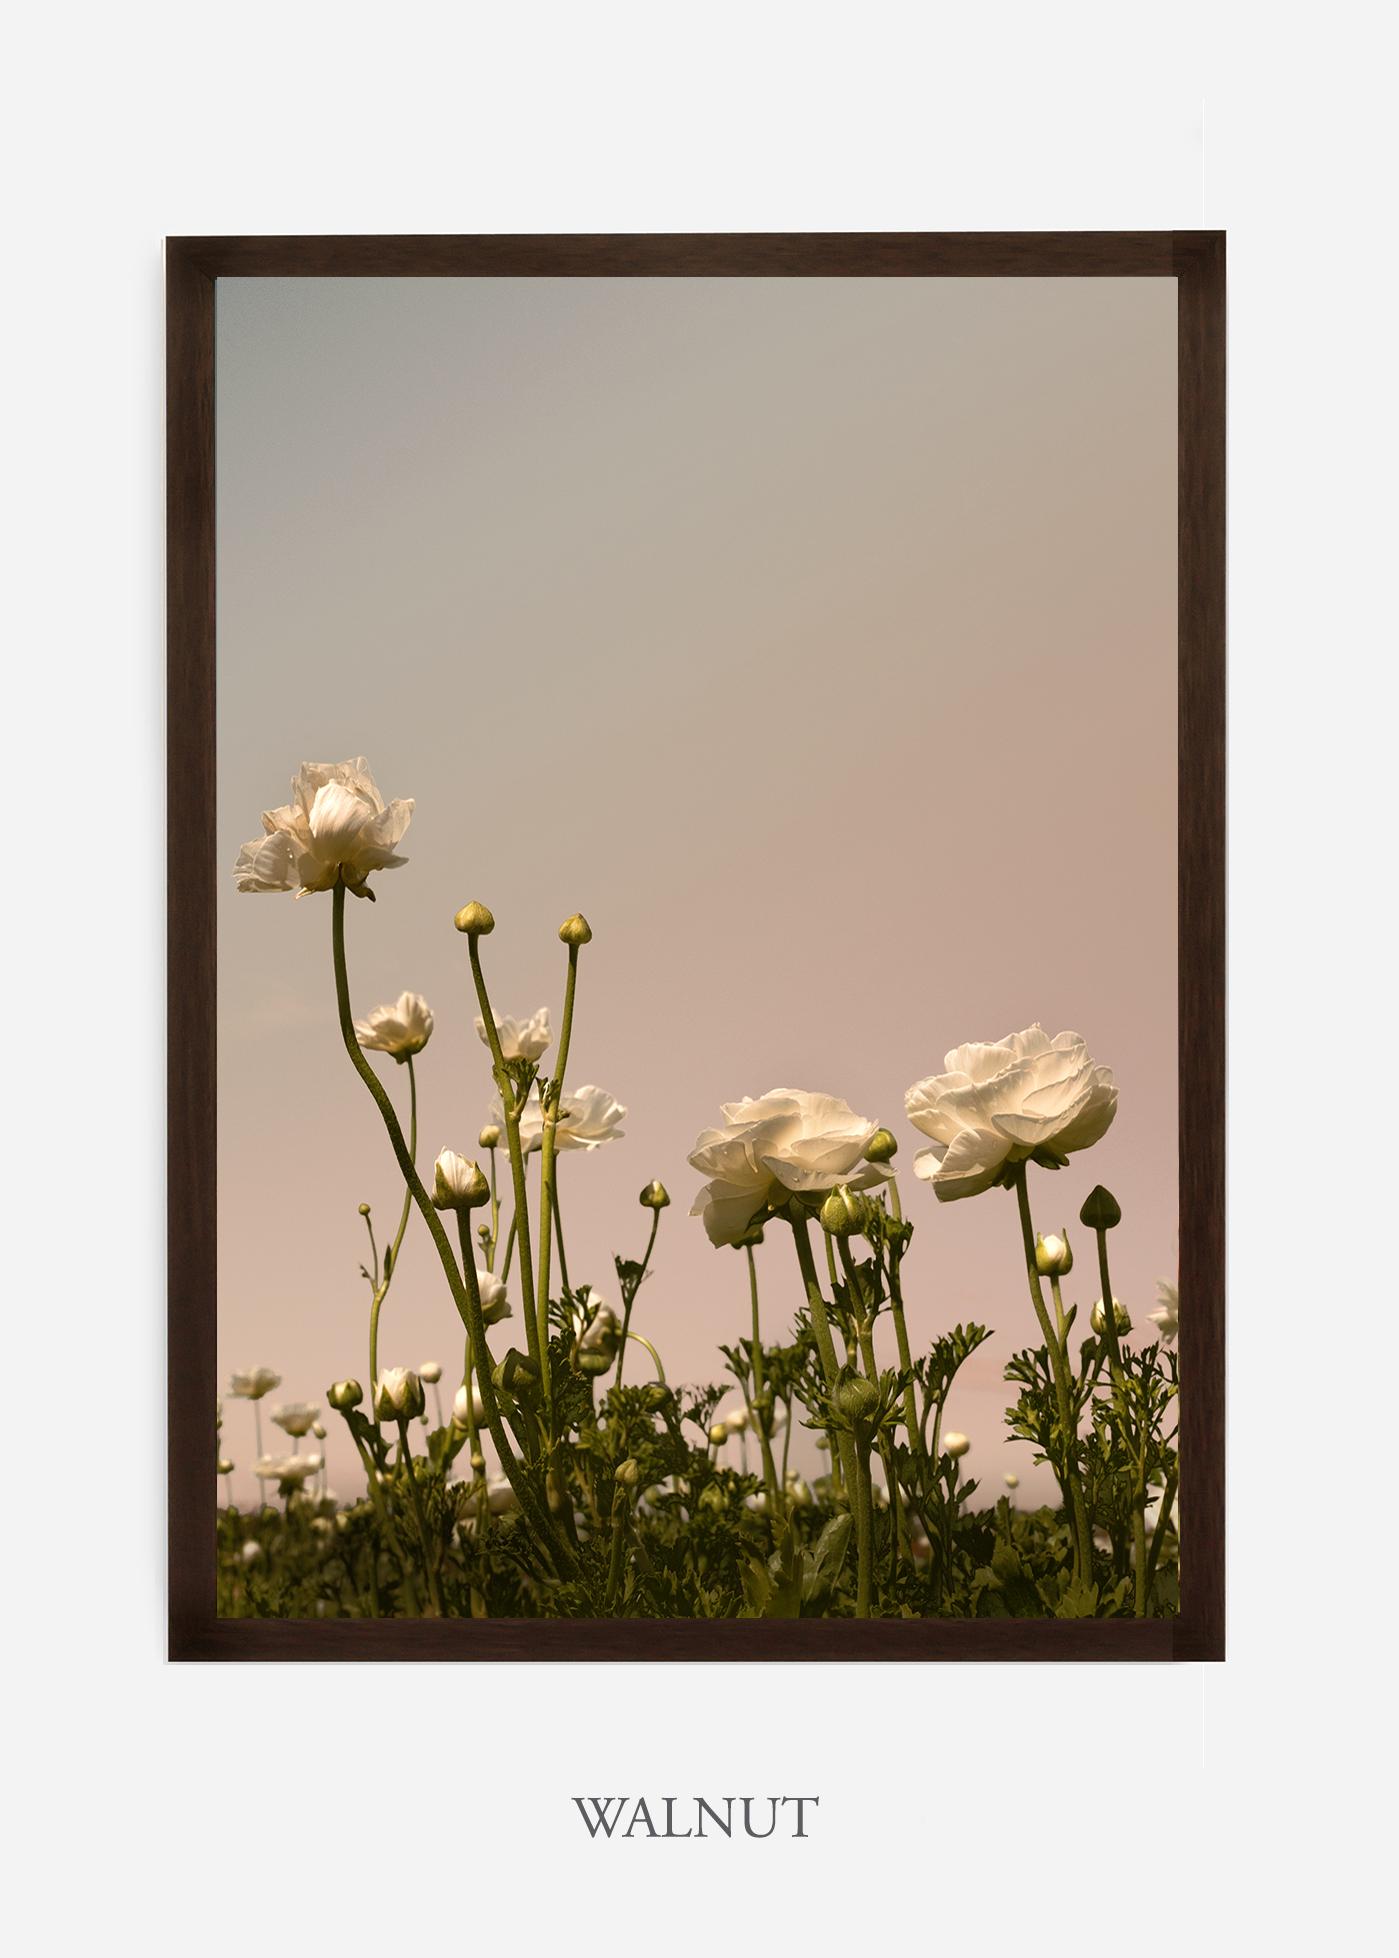 NoMat-Dark_Walnut-Frame-Floral-No-7-Wilder-California-Art-Floral-Home-decor-Prints-Dahlia-Botanical-Artwork-Interior-design.jpg